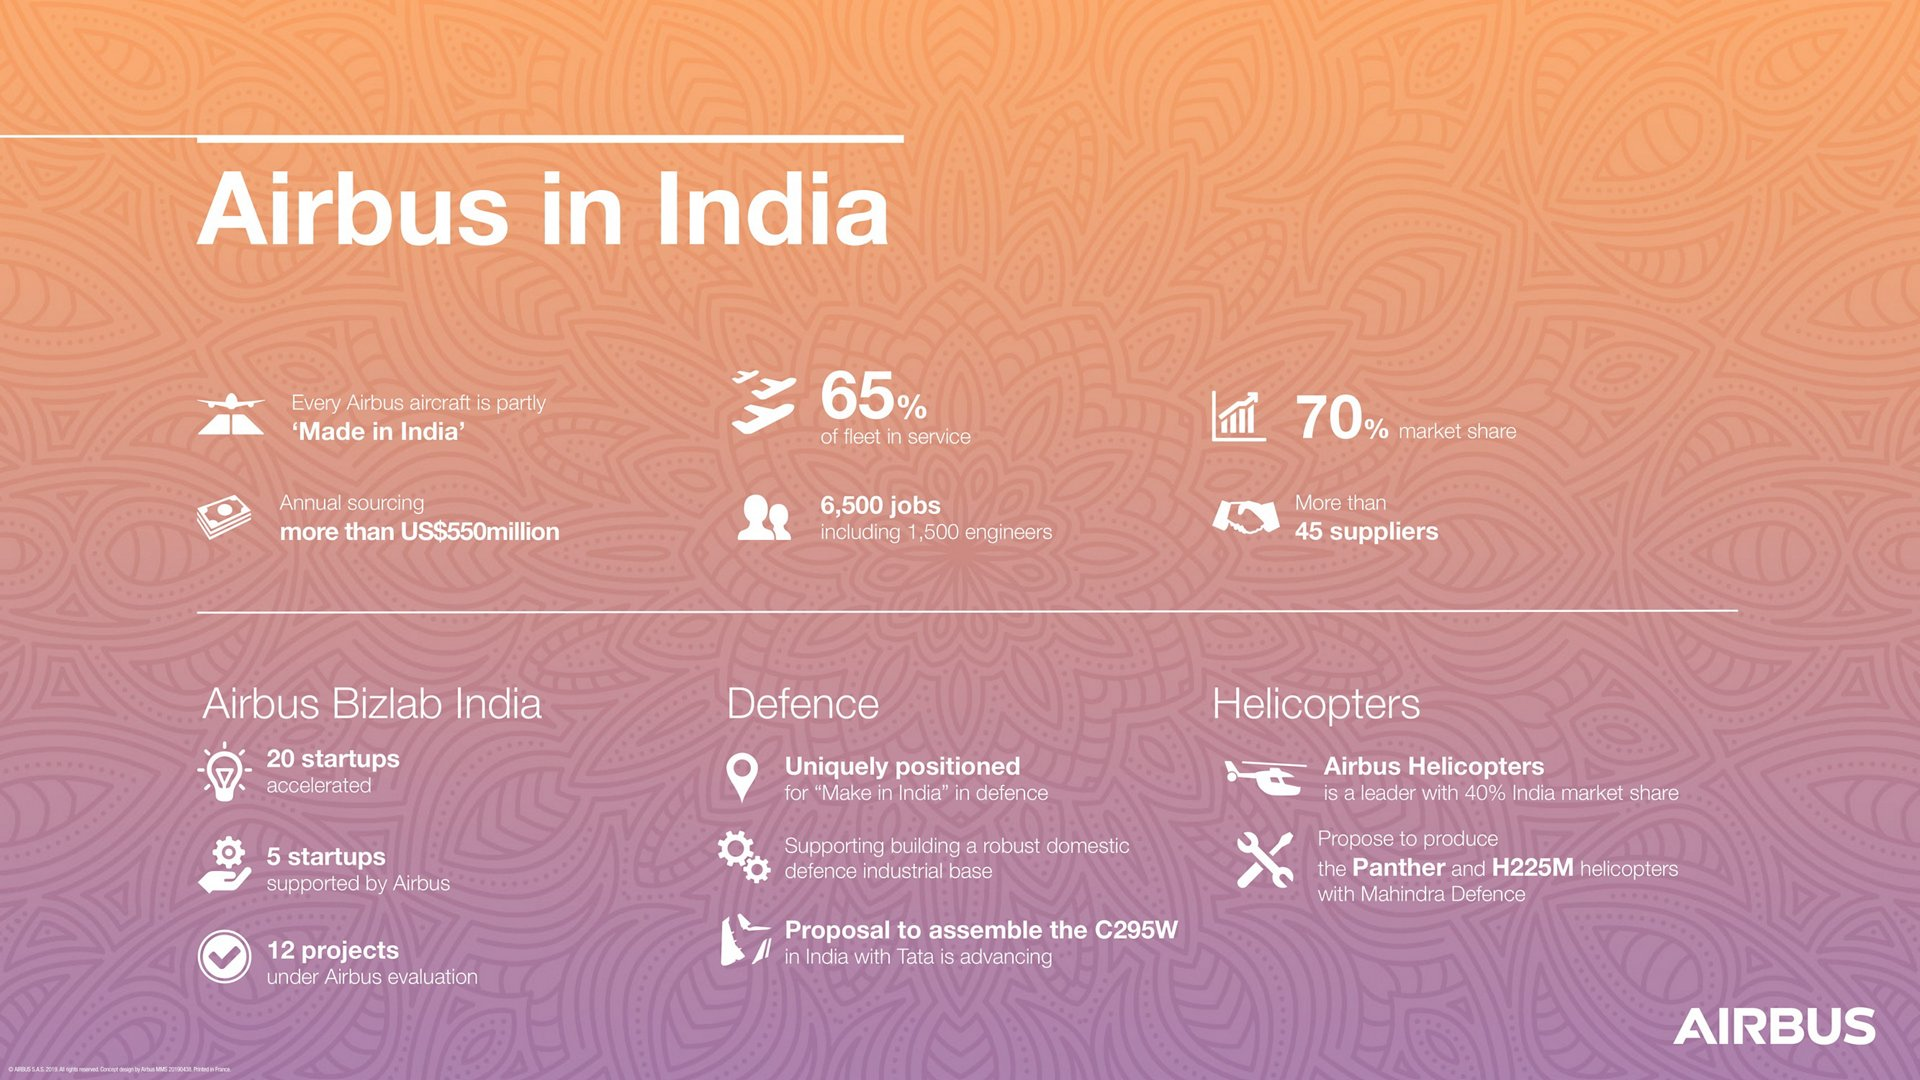 Airbus in India - Worldwide presence - Airbus